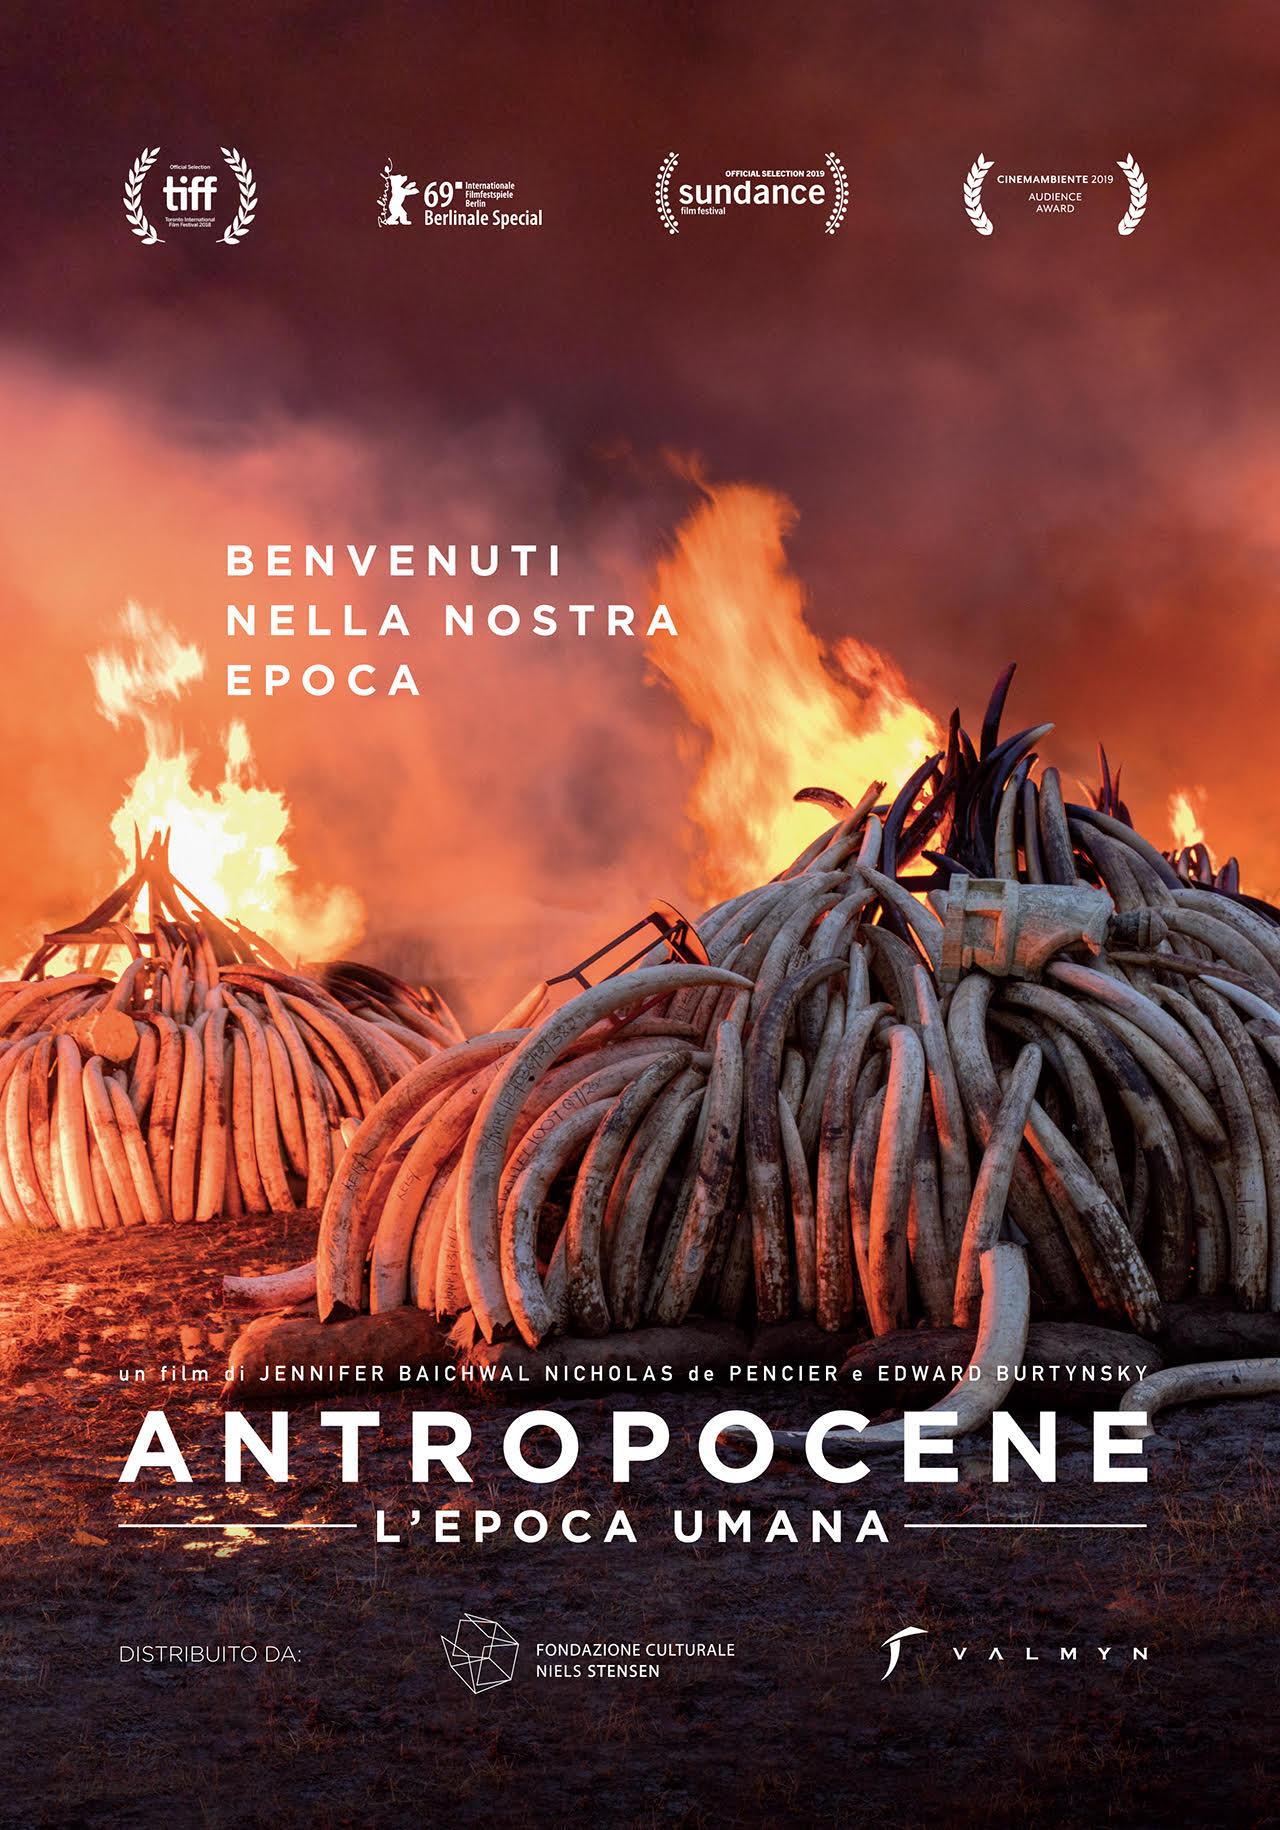 antropocene film